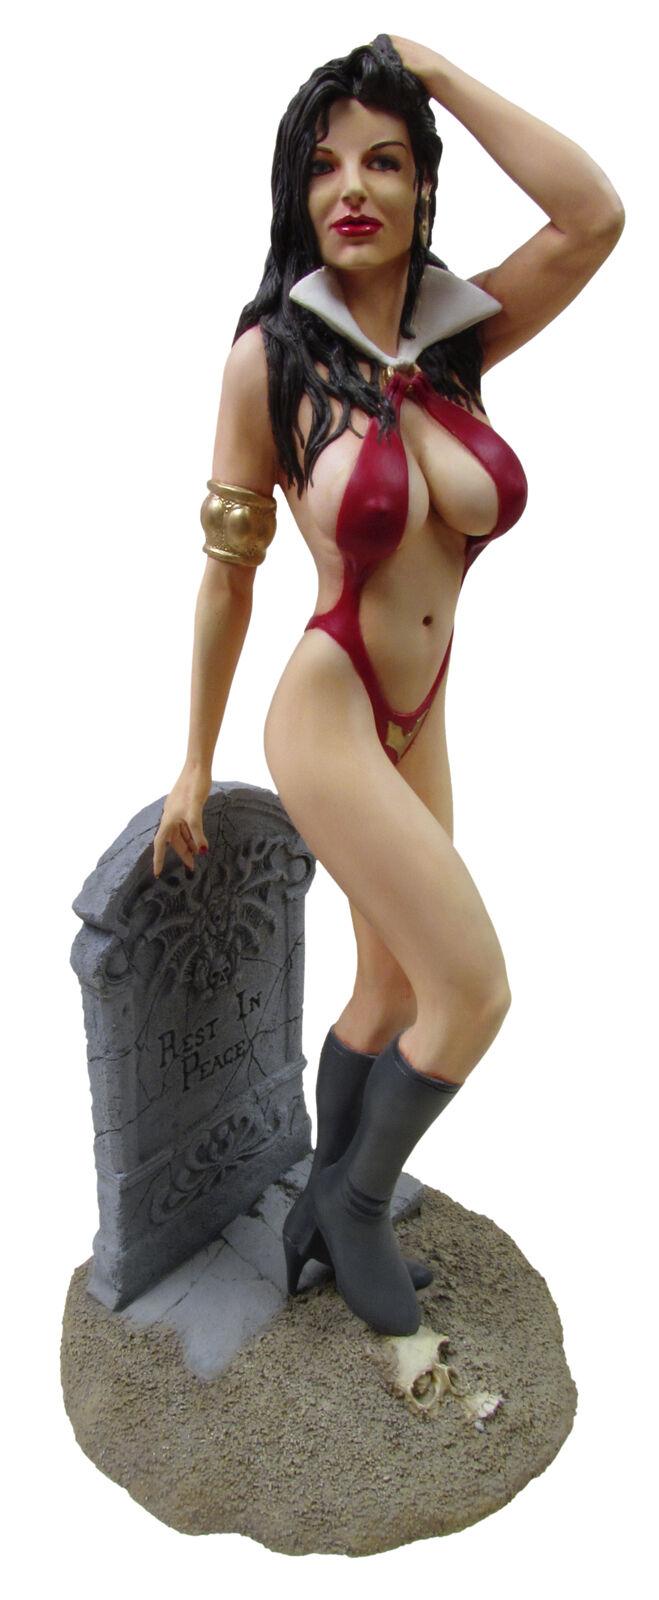 mejor precio Jimmy Flintstone sexo en el Cementerio De Resina Resina Resina Figura Kit  servicio de primera clase